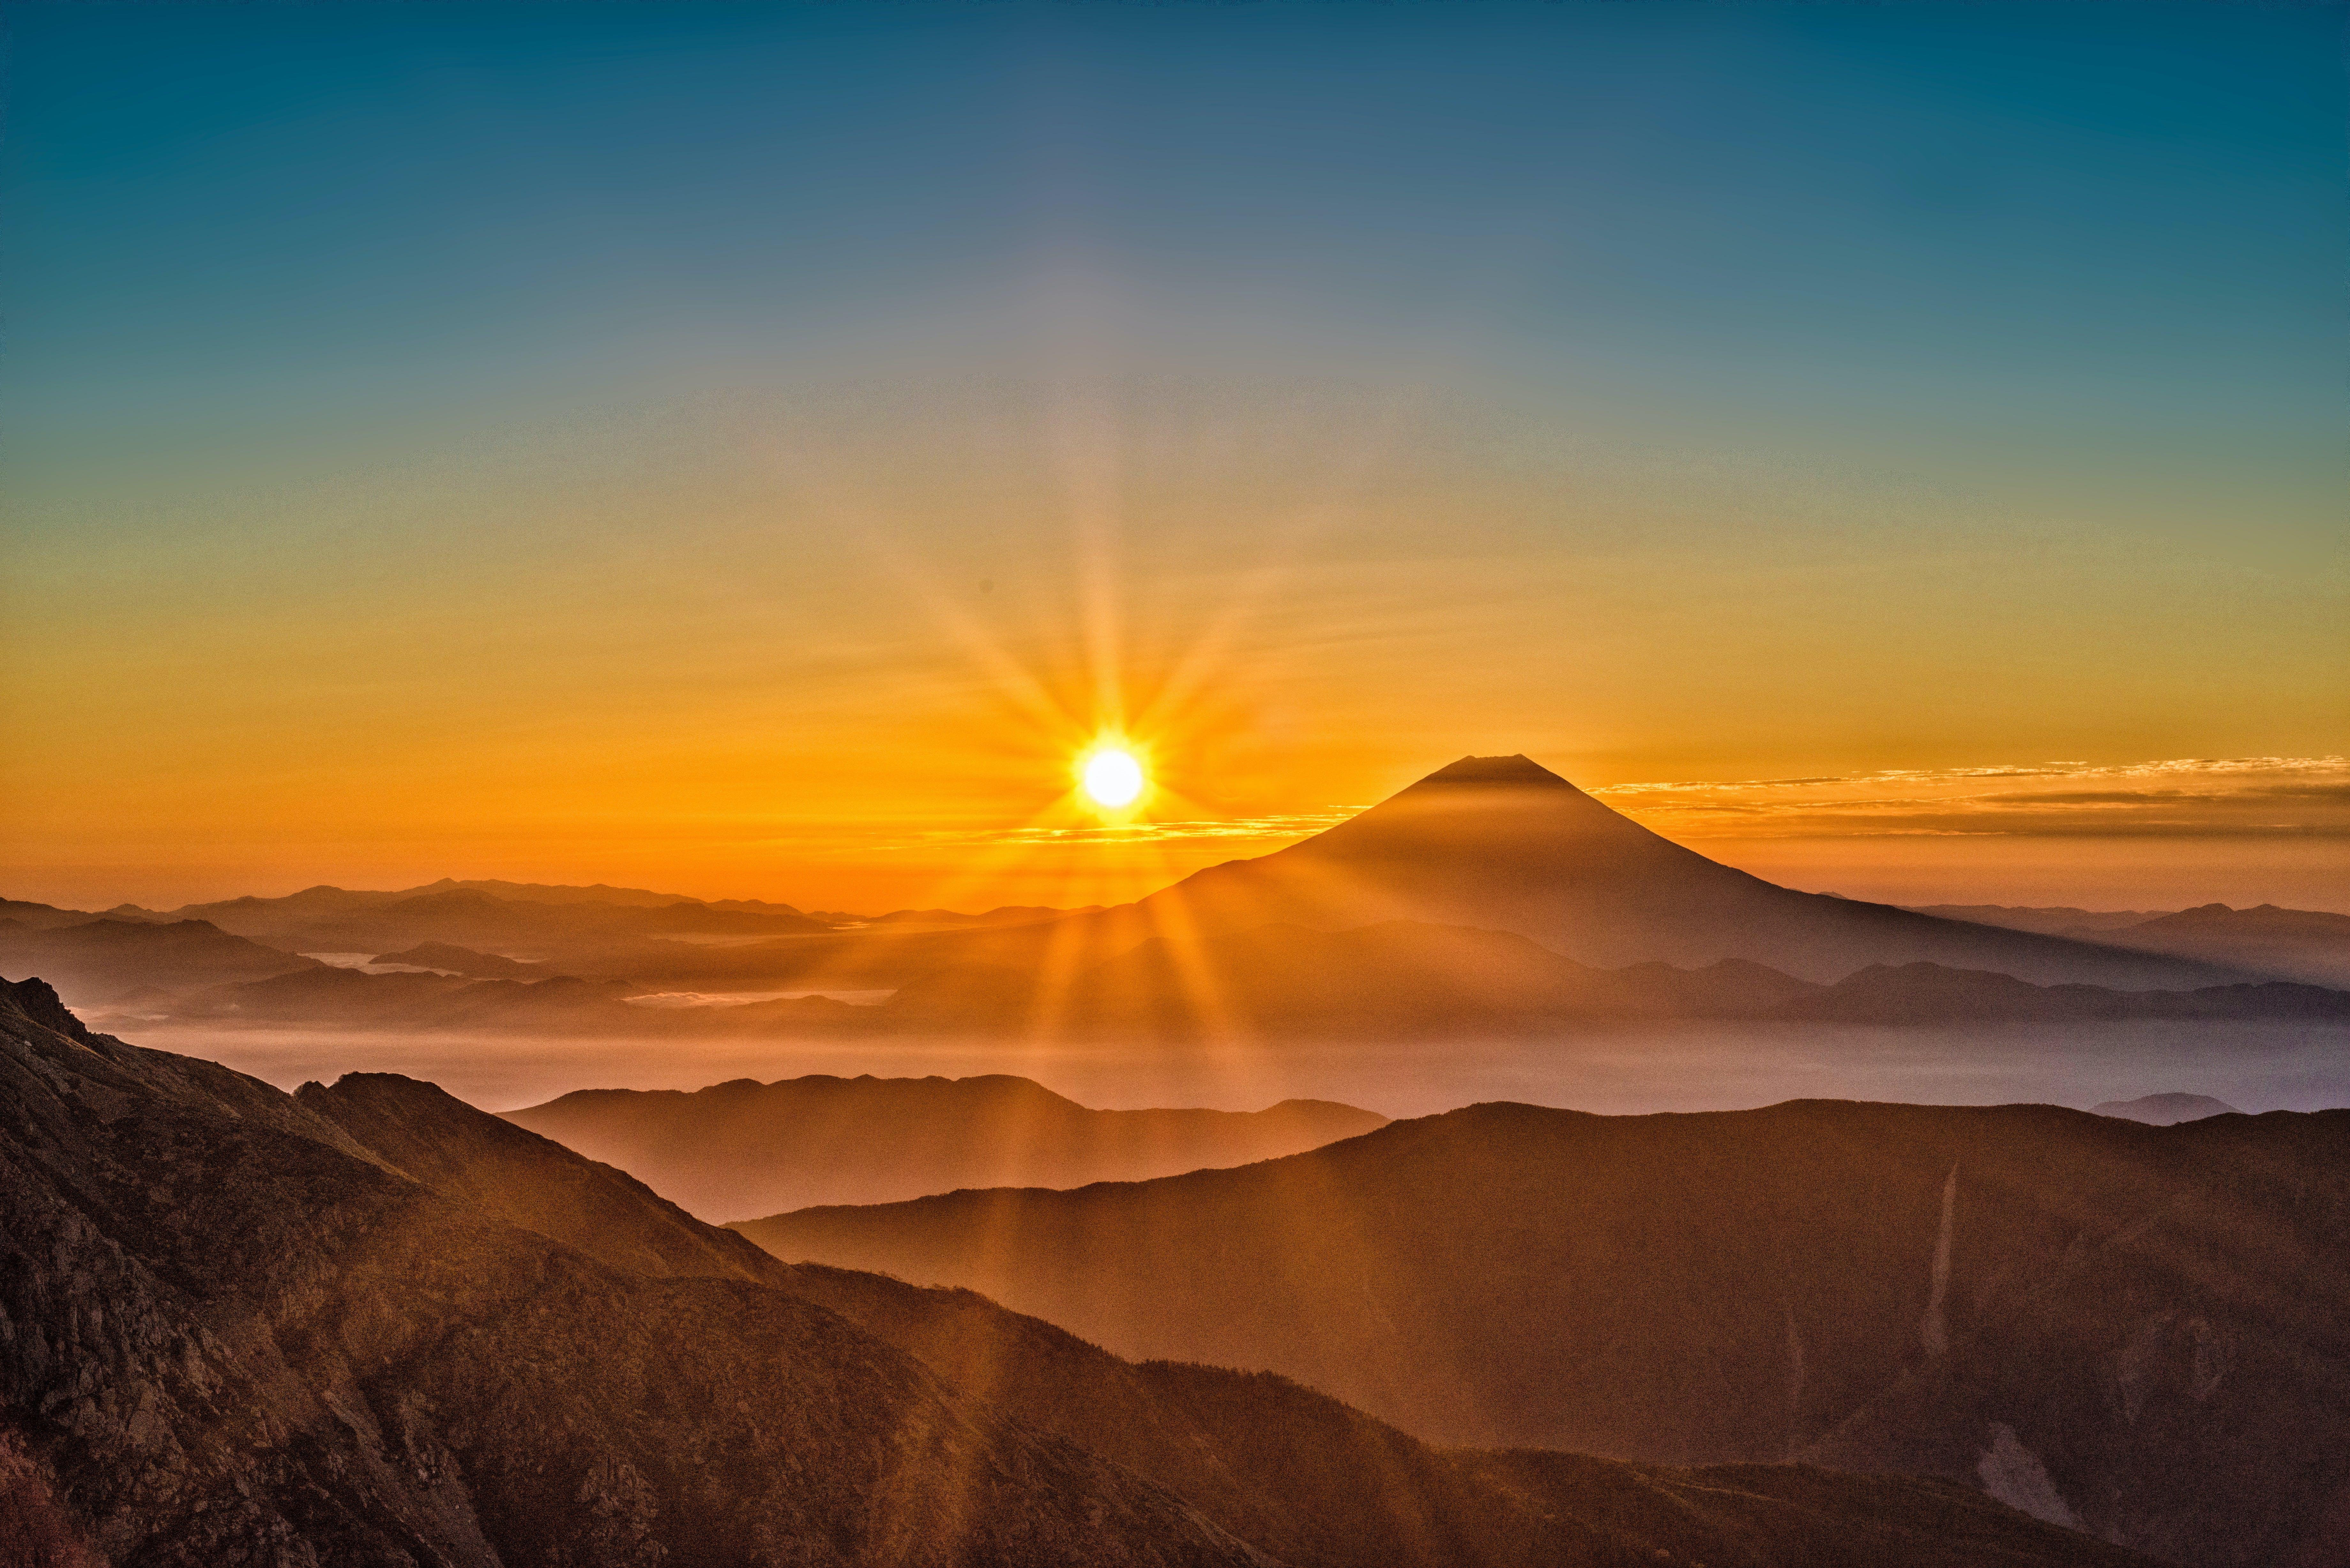 clouds, dawn, desert